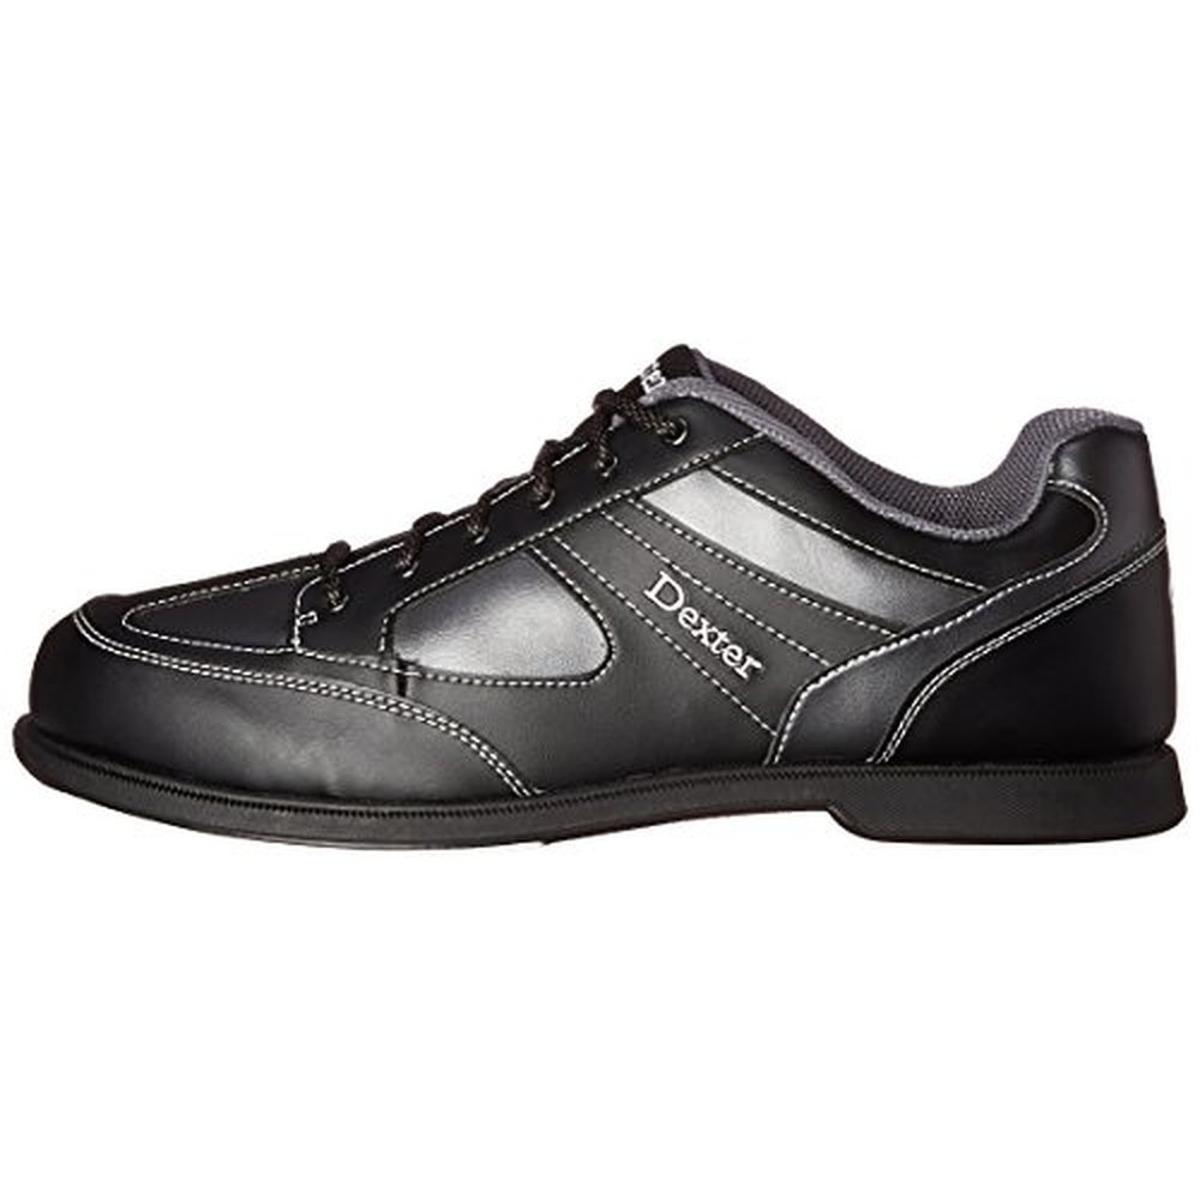 f498a5d1a Dexter Pro Am II Black Gray Men s RIGHT HAND Bowling Shoes